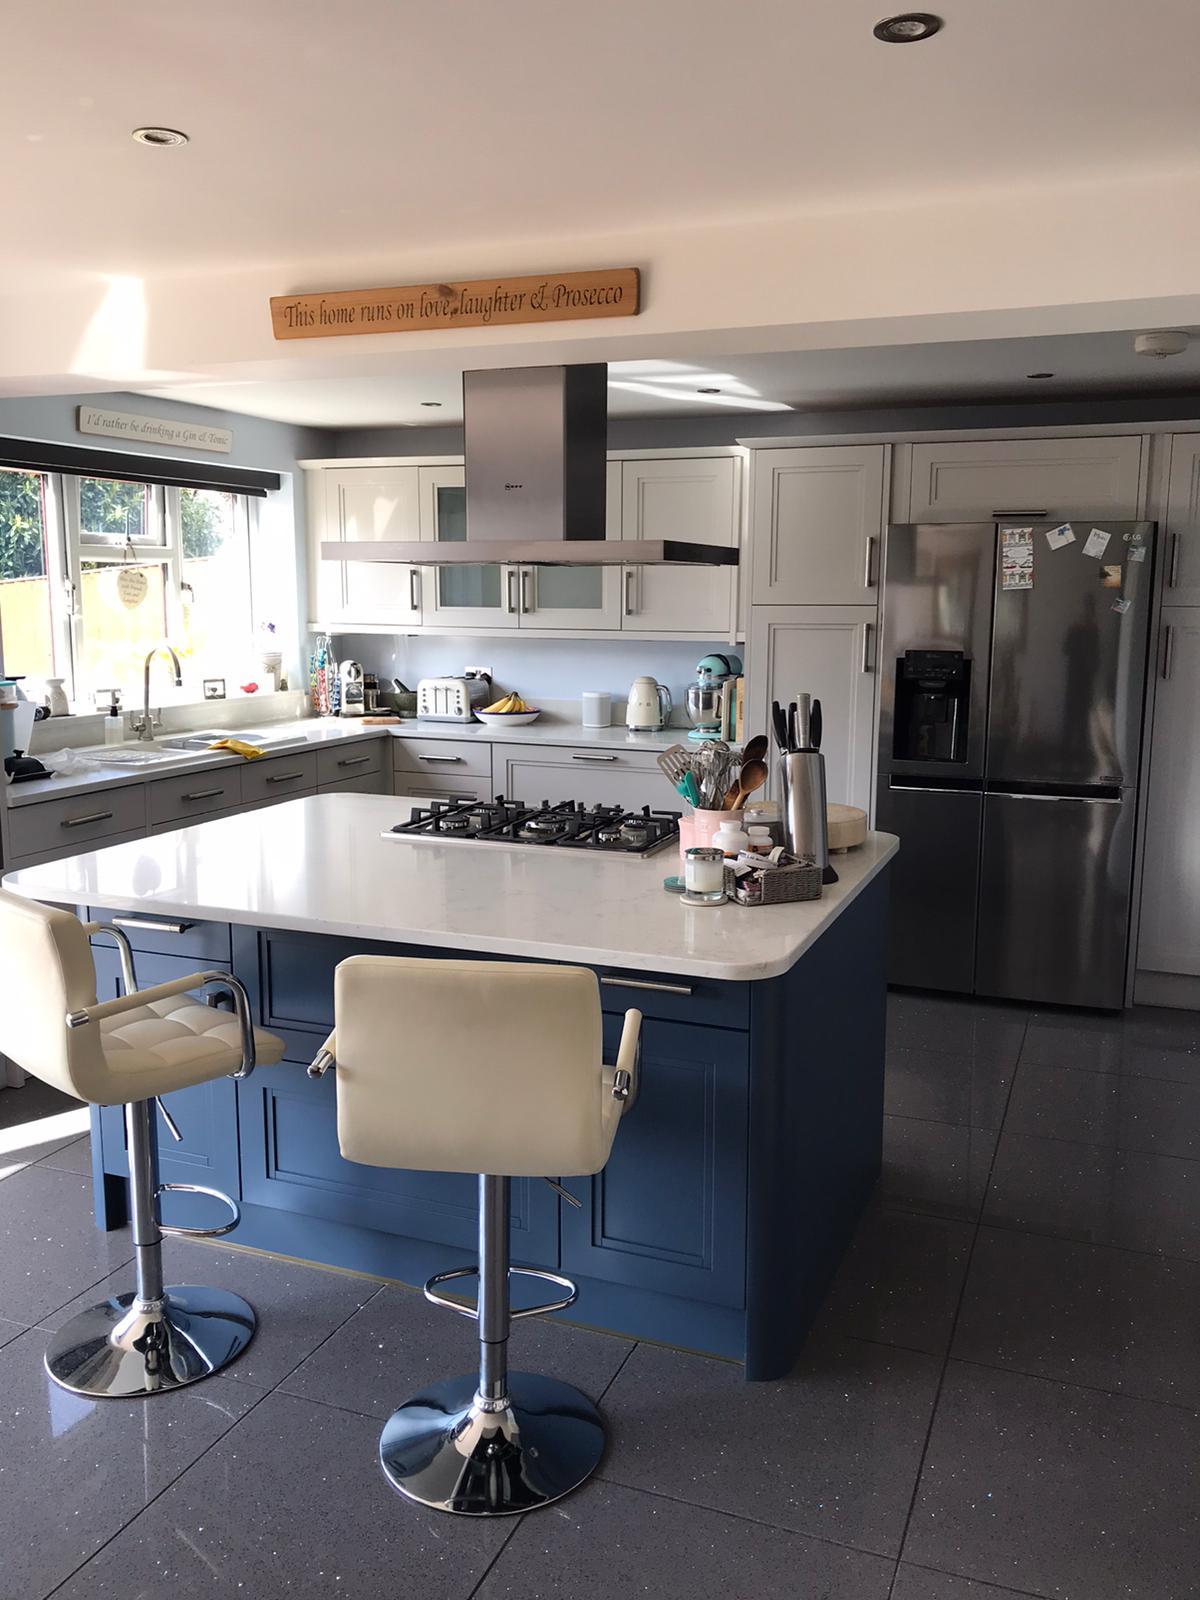 Kitchen cabinet painter Wooburn Green Buckinghamshire